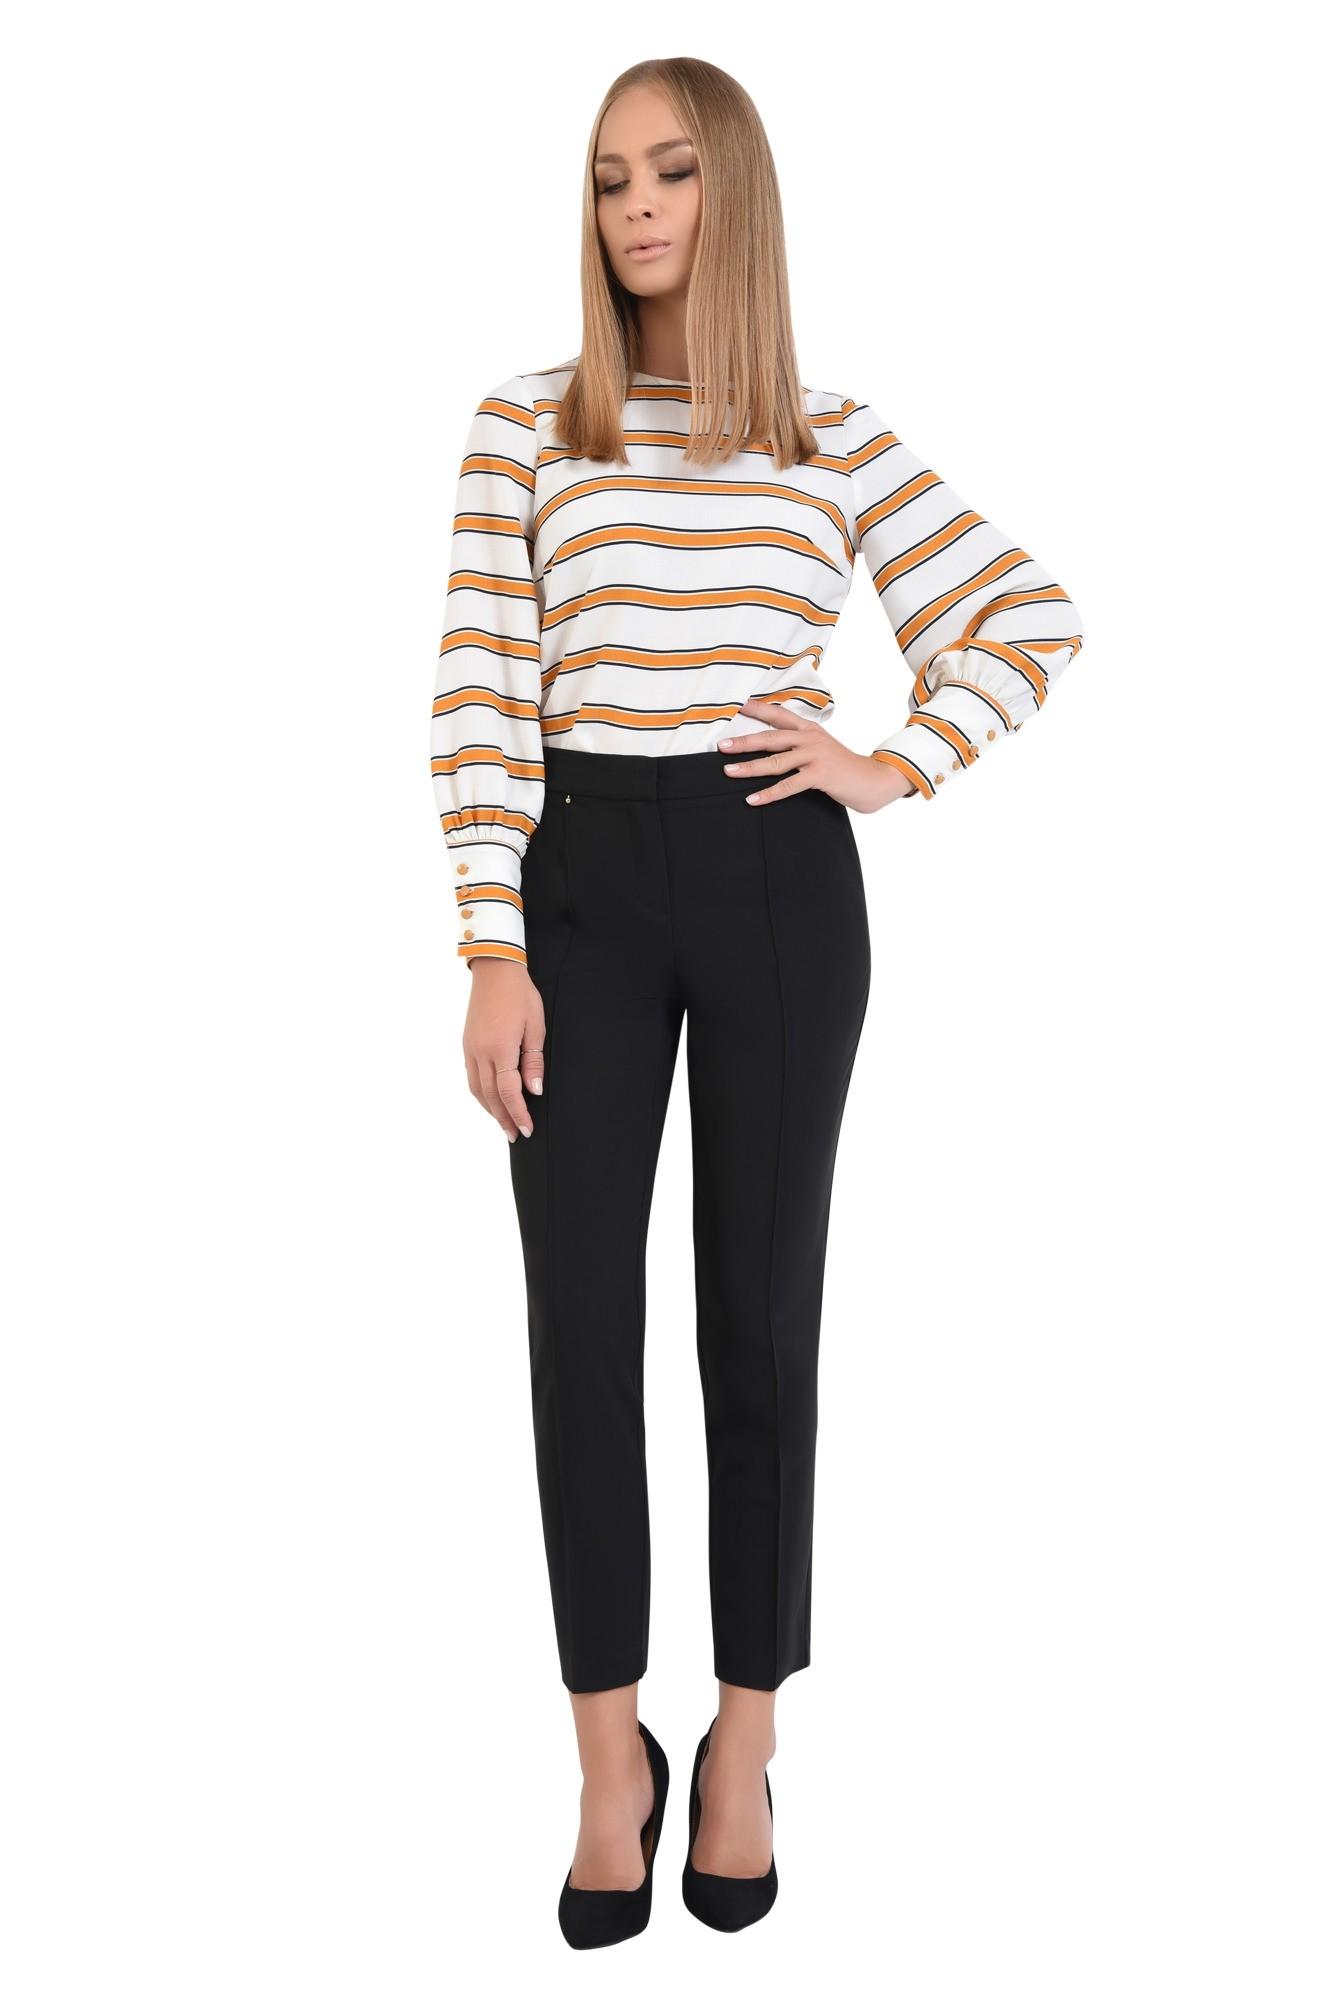 0 - pantaloni conici, negru, talie medie